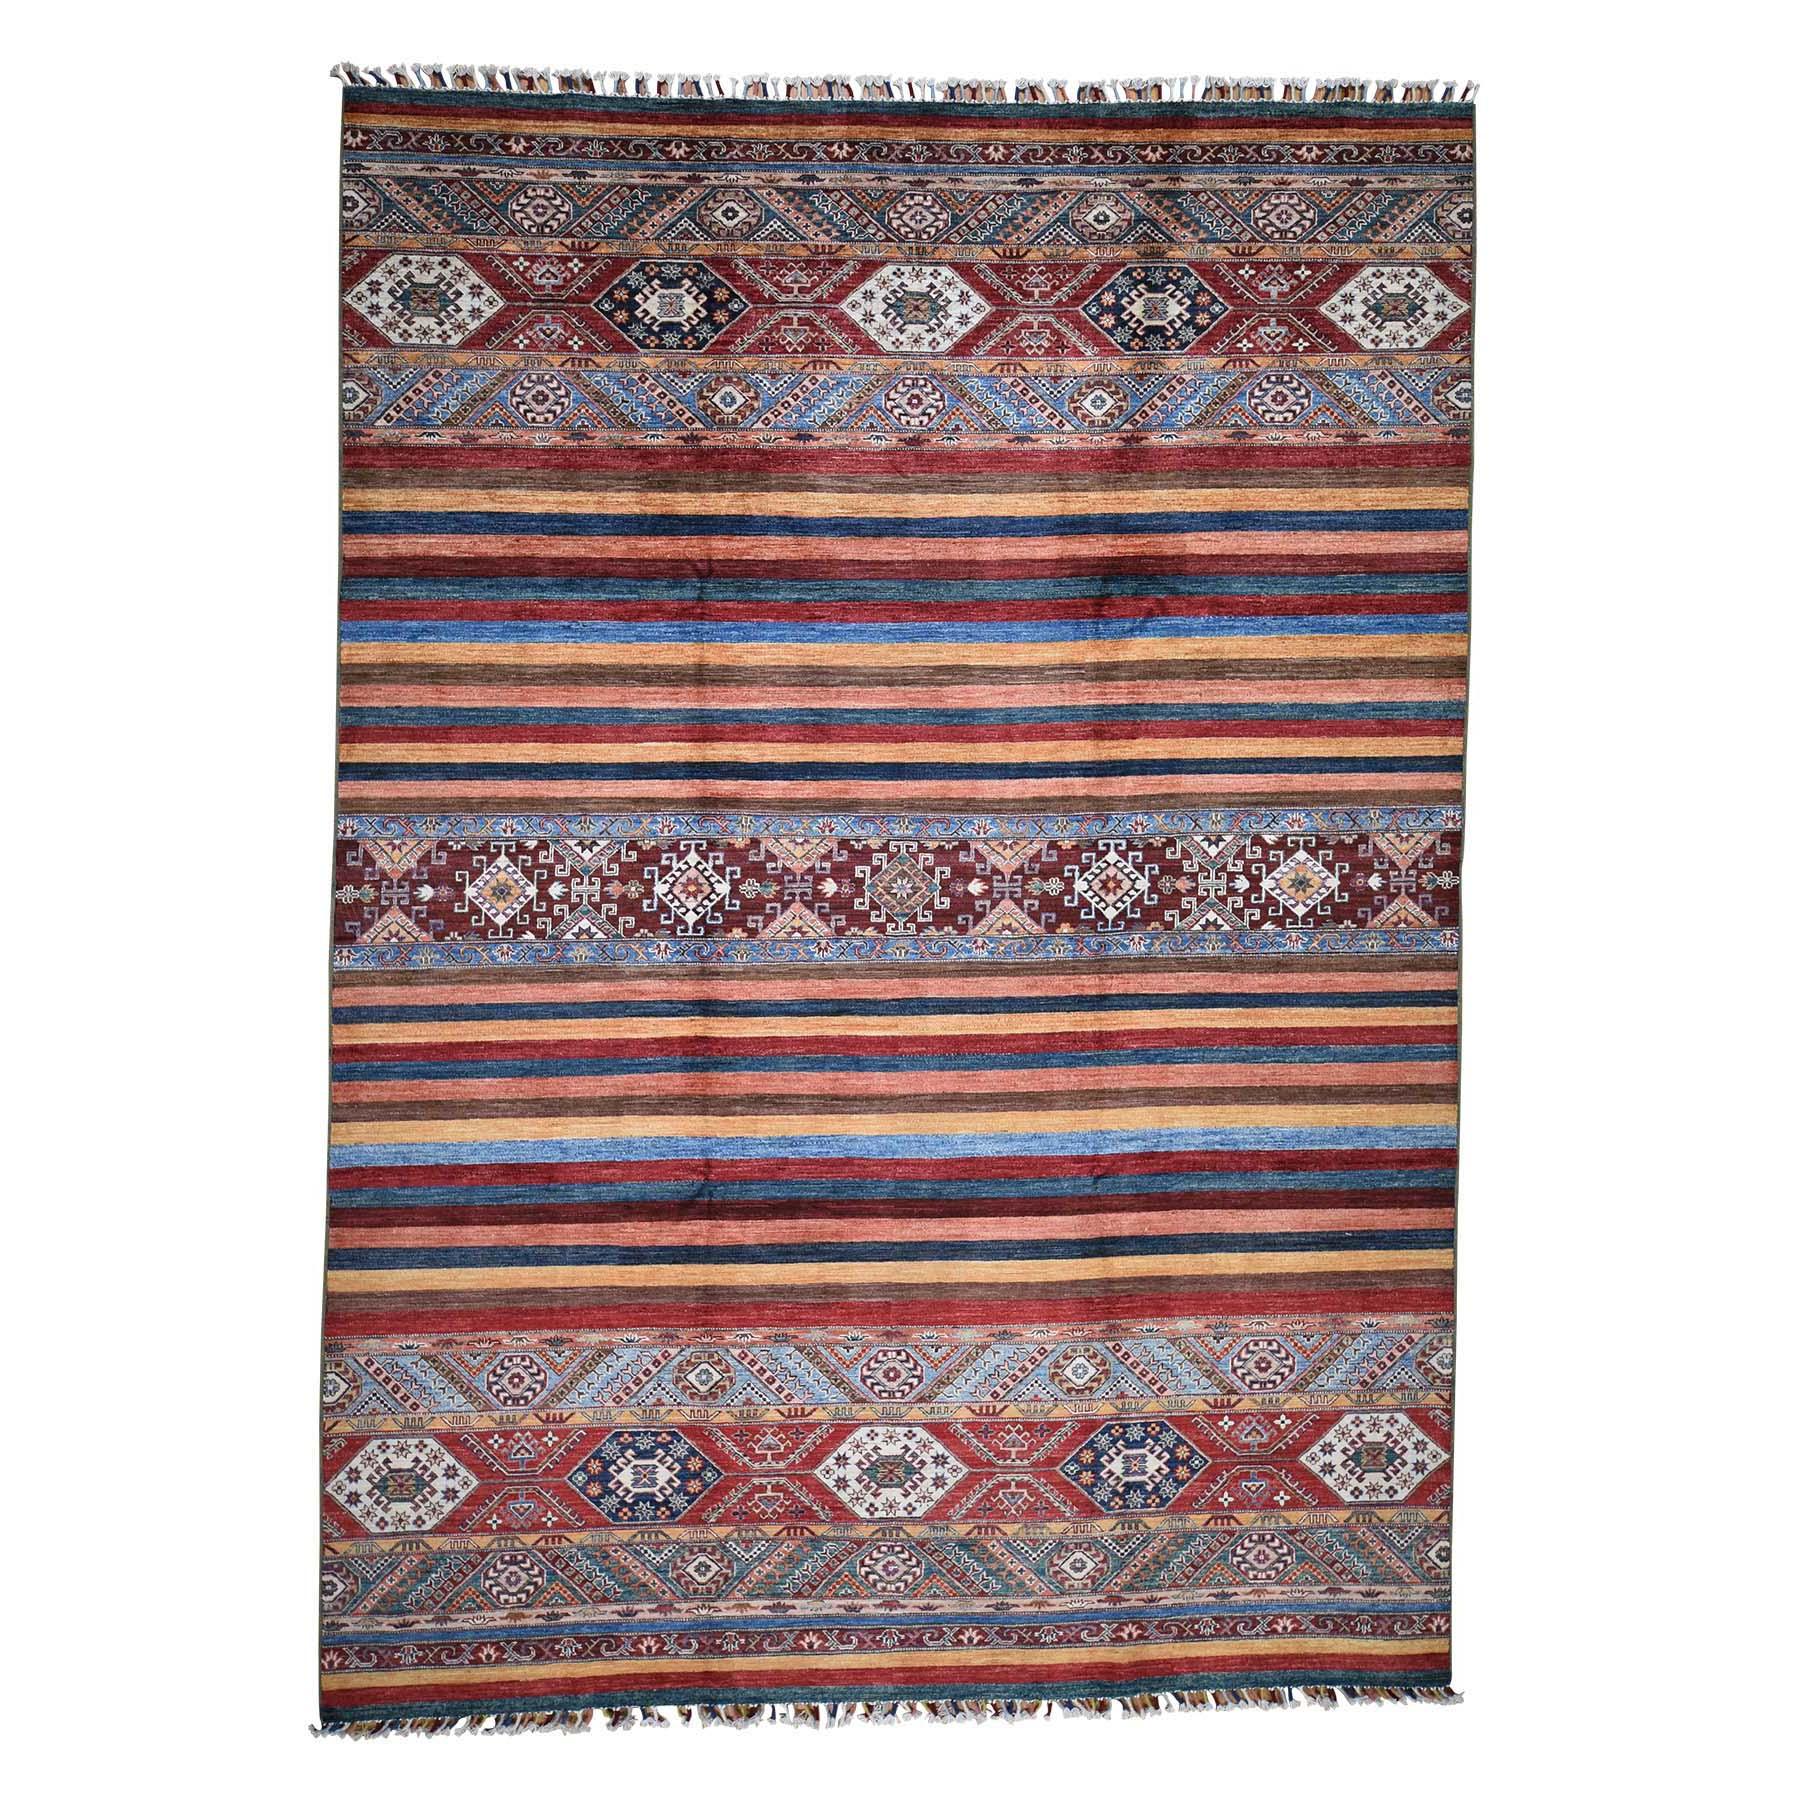 "8'3""x11'8"" Khorjin Design Super Kazak Hand-Knotted Pure Wool Oriental Rug"